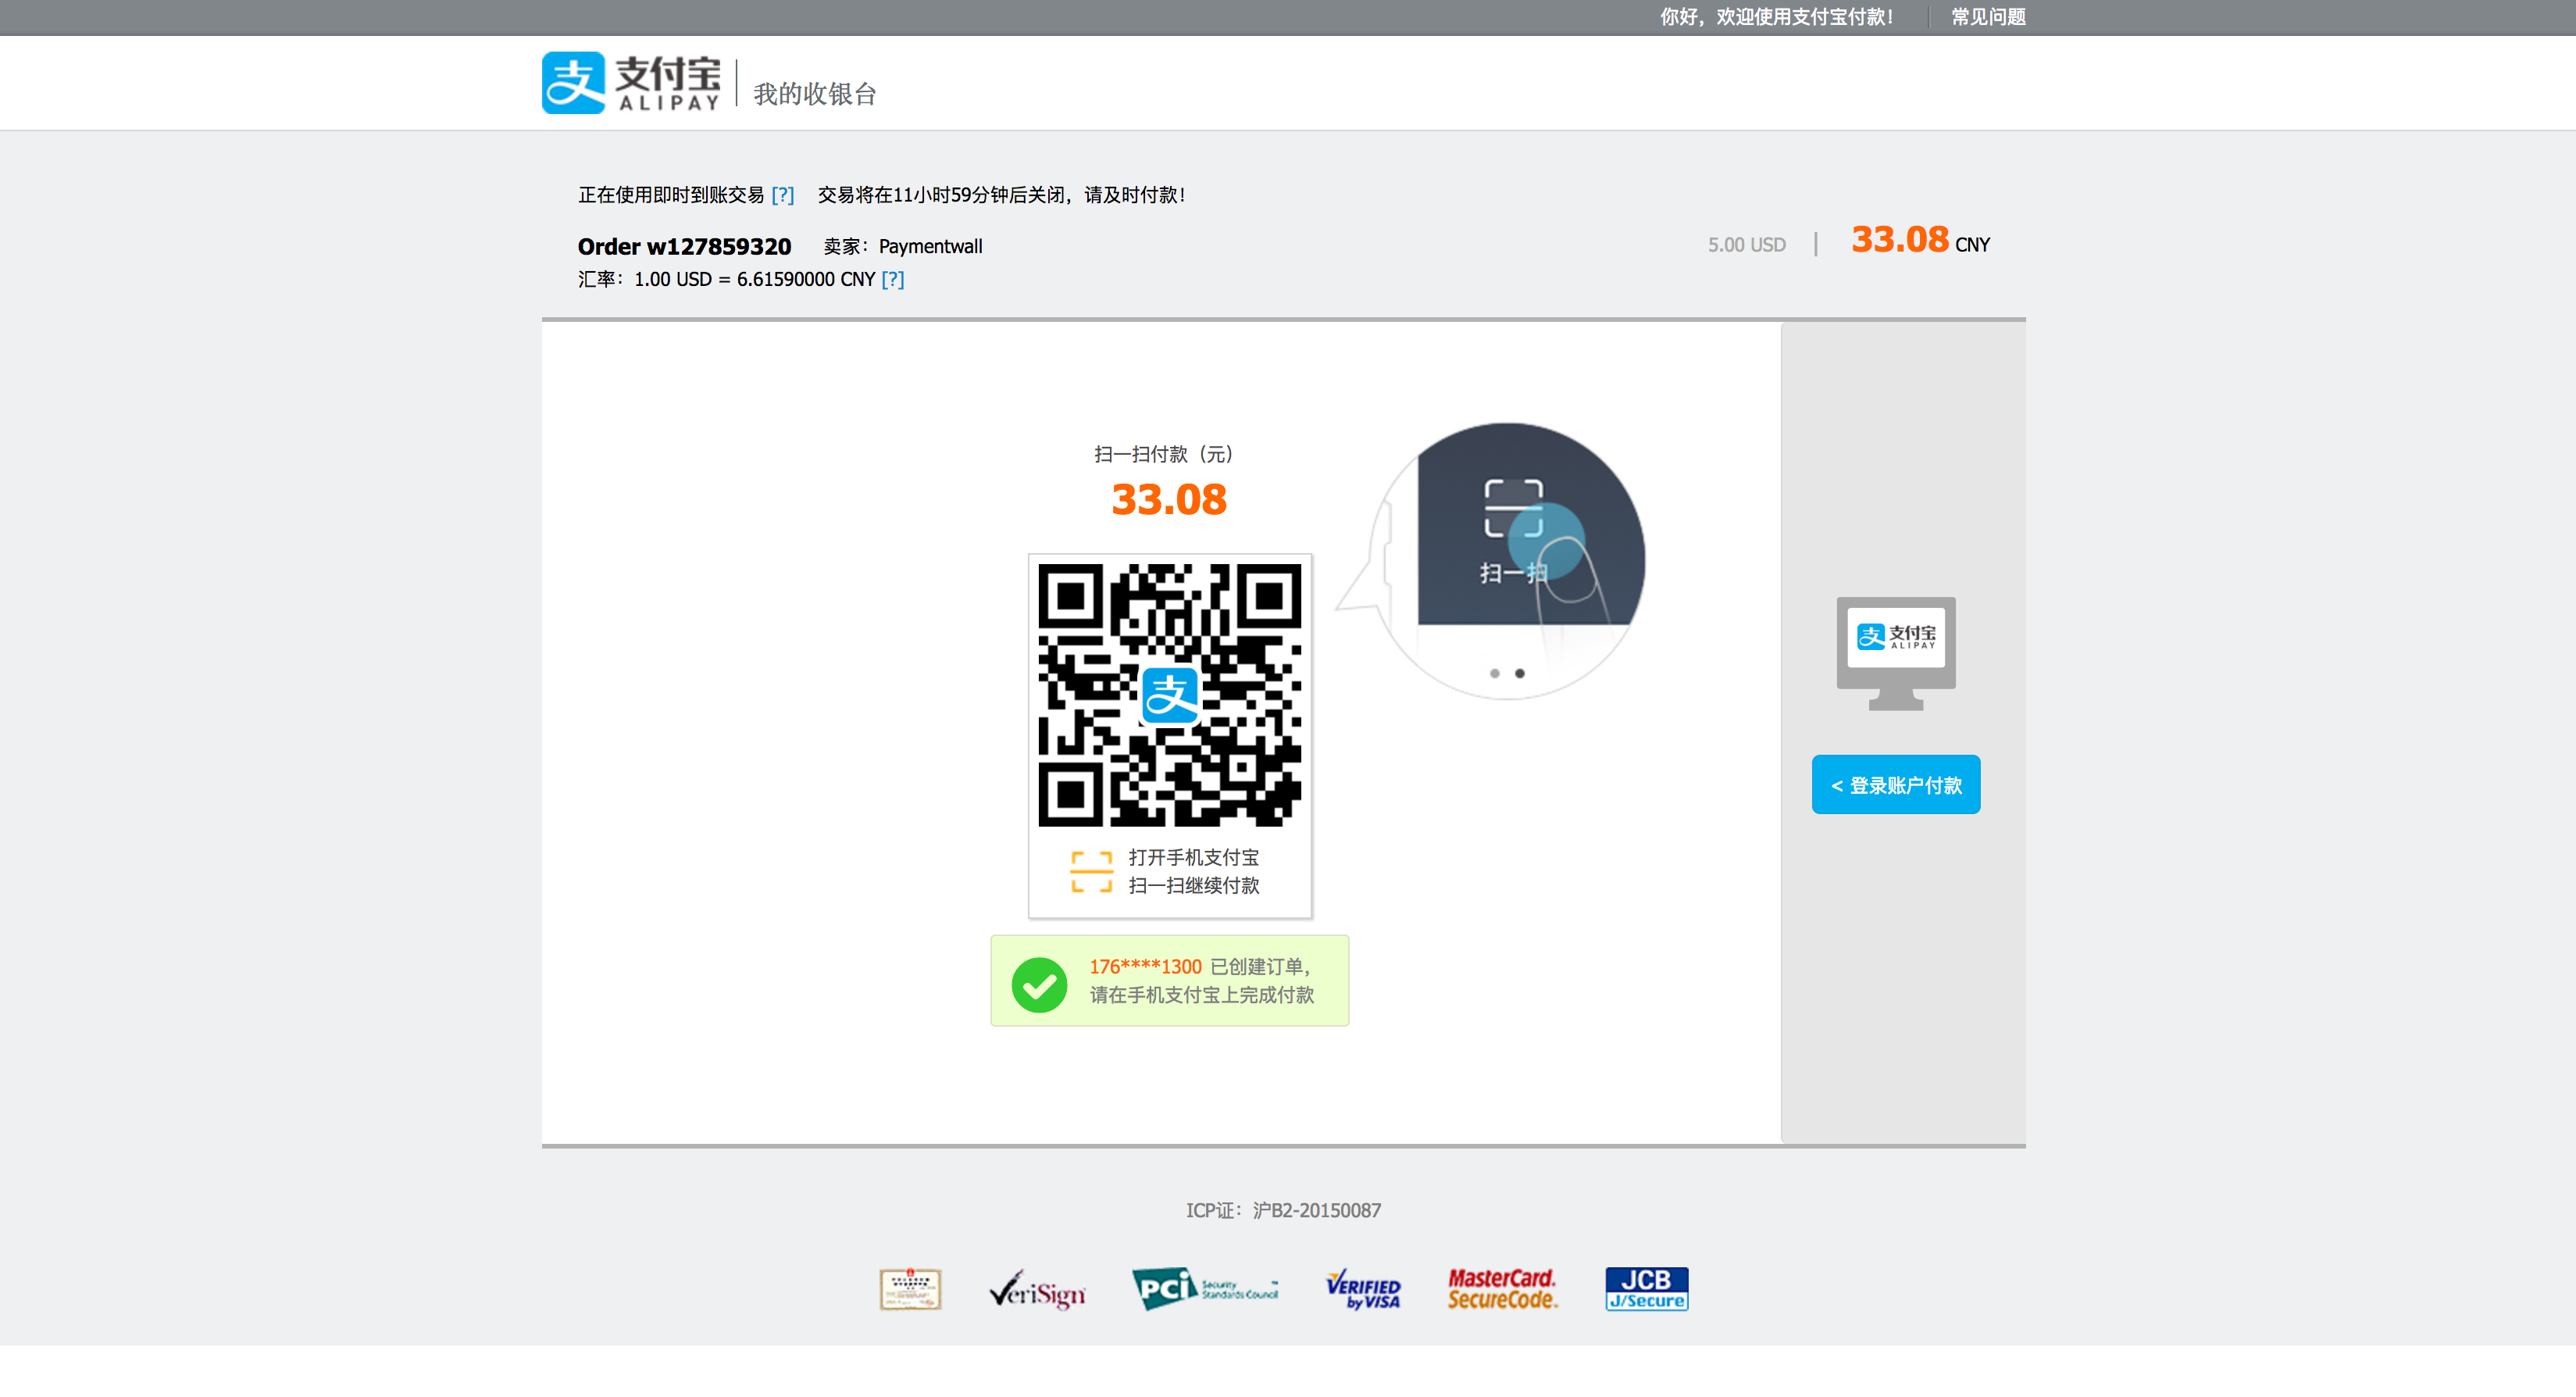 Alipay scan